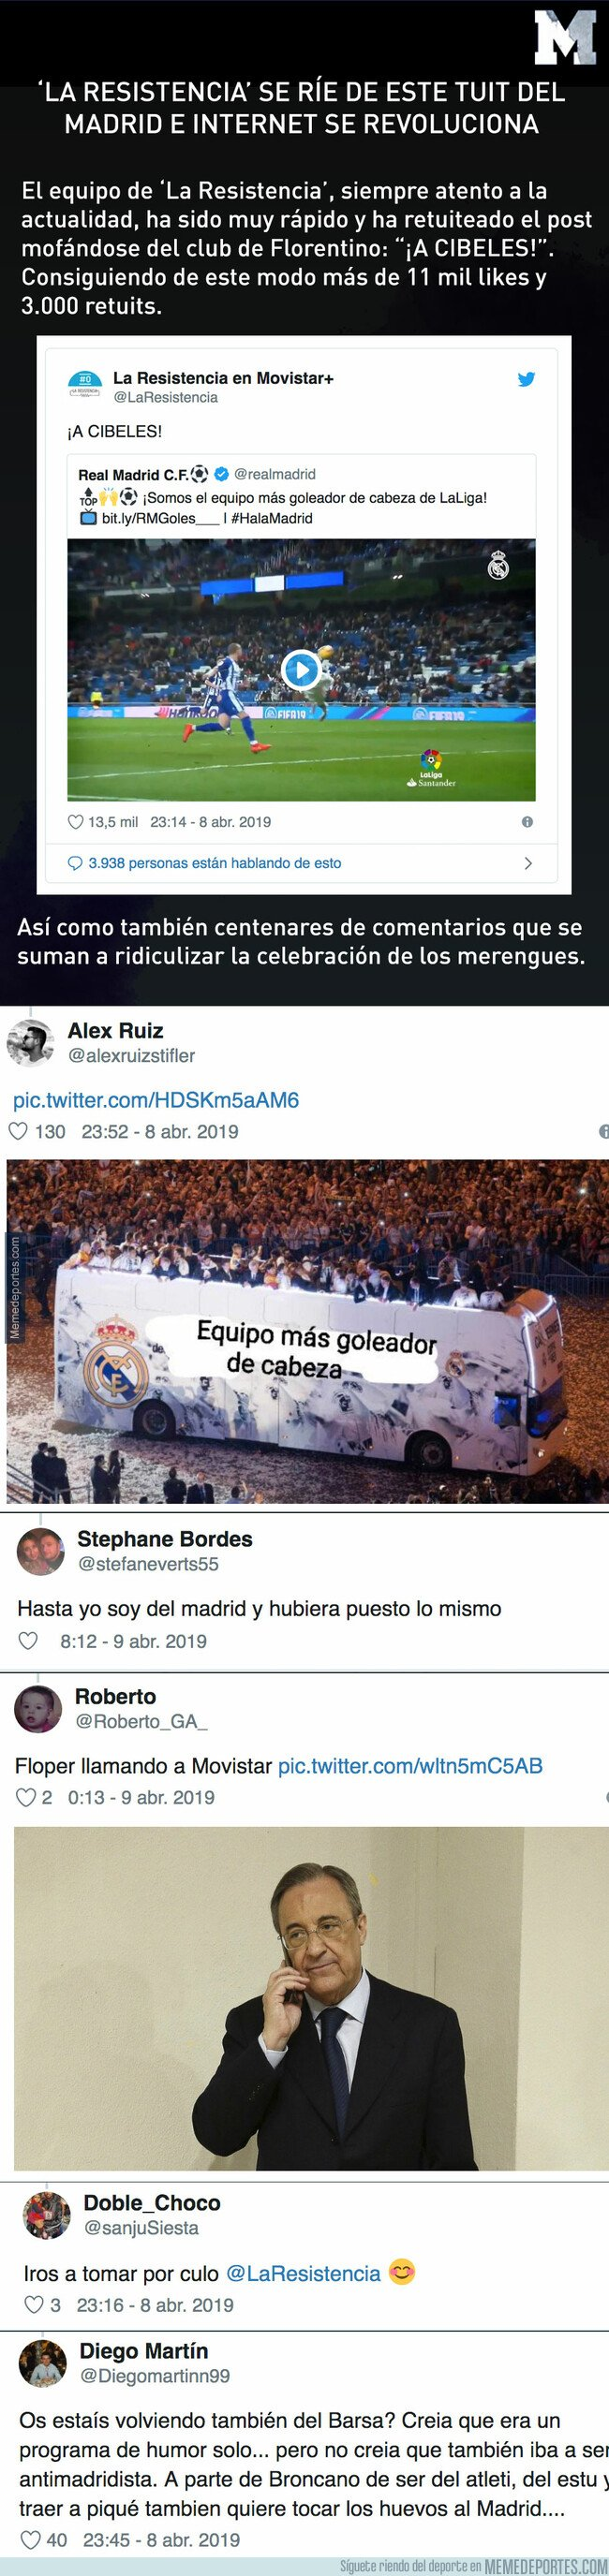 1070806 - La Resistencia se burla de este tuit del Real Madrid e internet se revoluciona